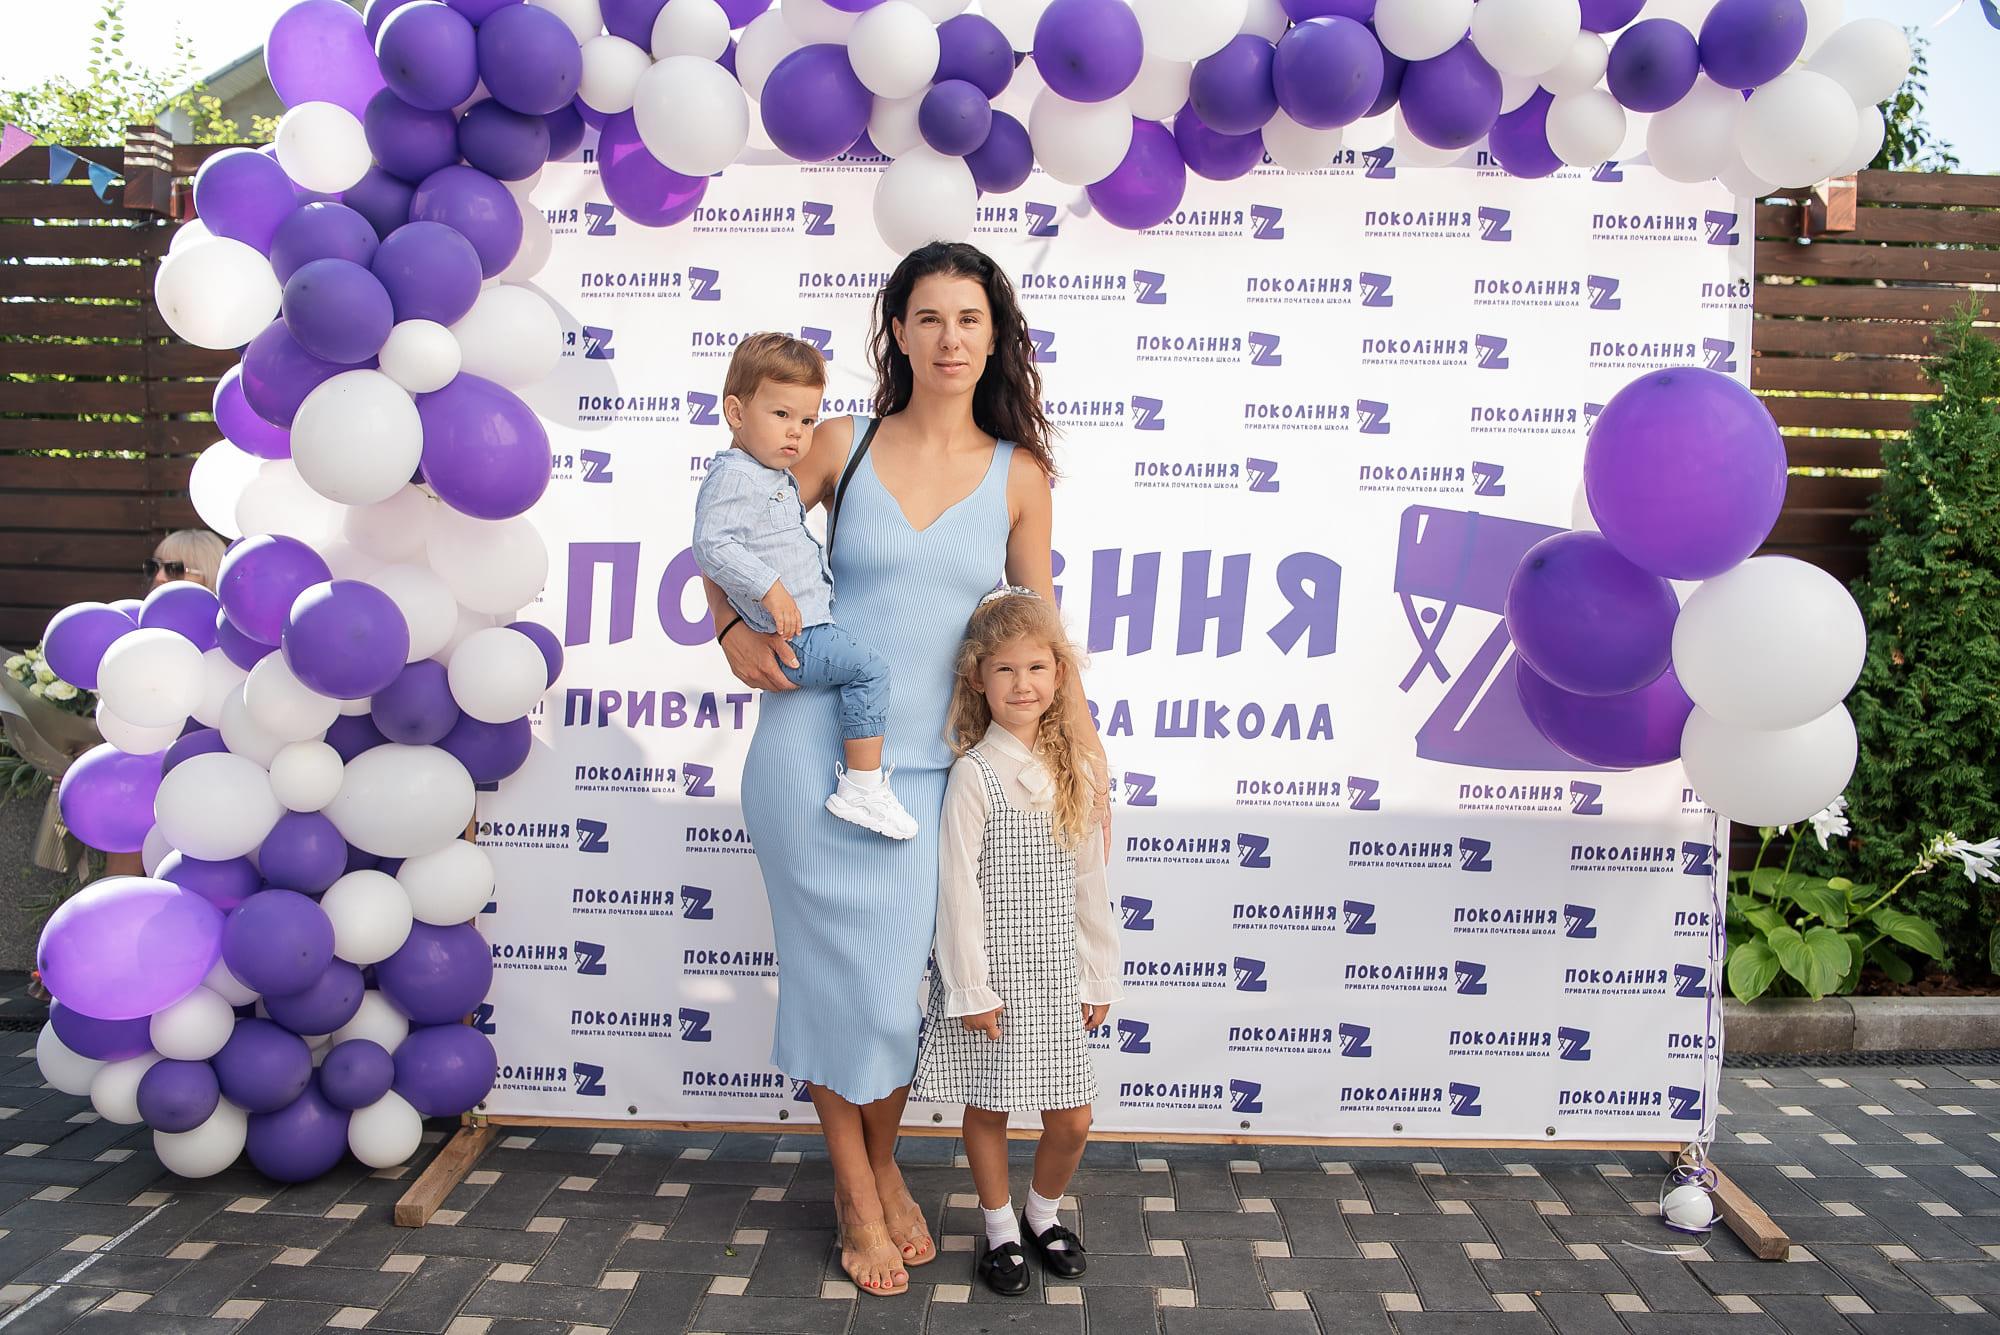 https://akademia-detstva.od.ua/app/uploads/2021/09/94.jpg